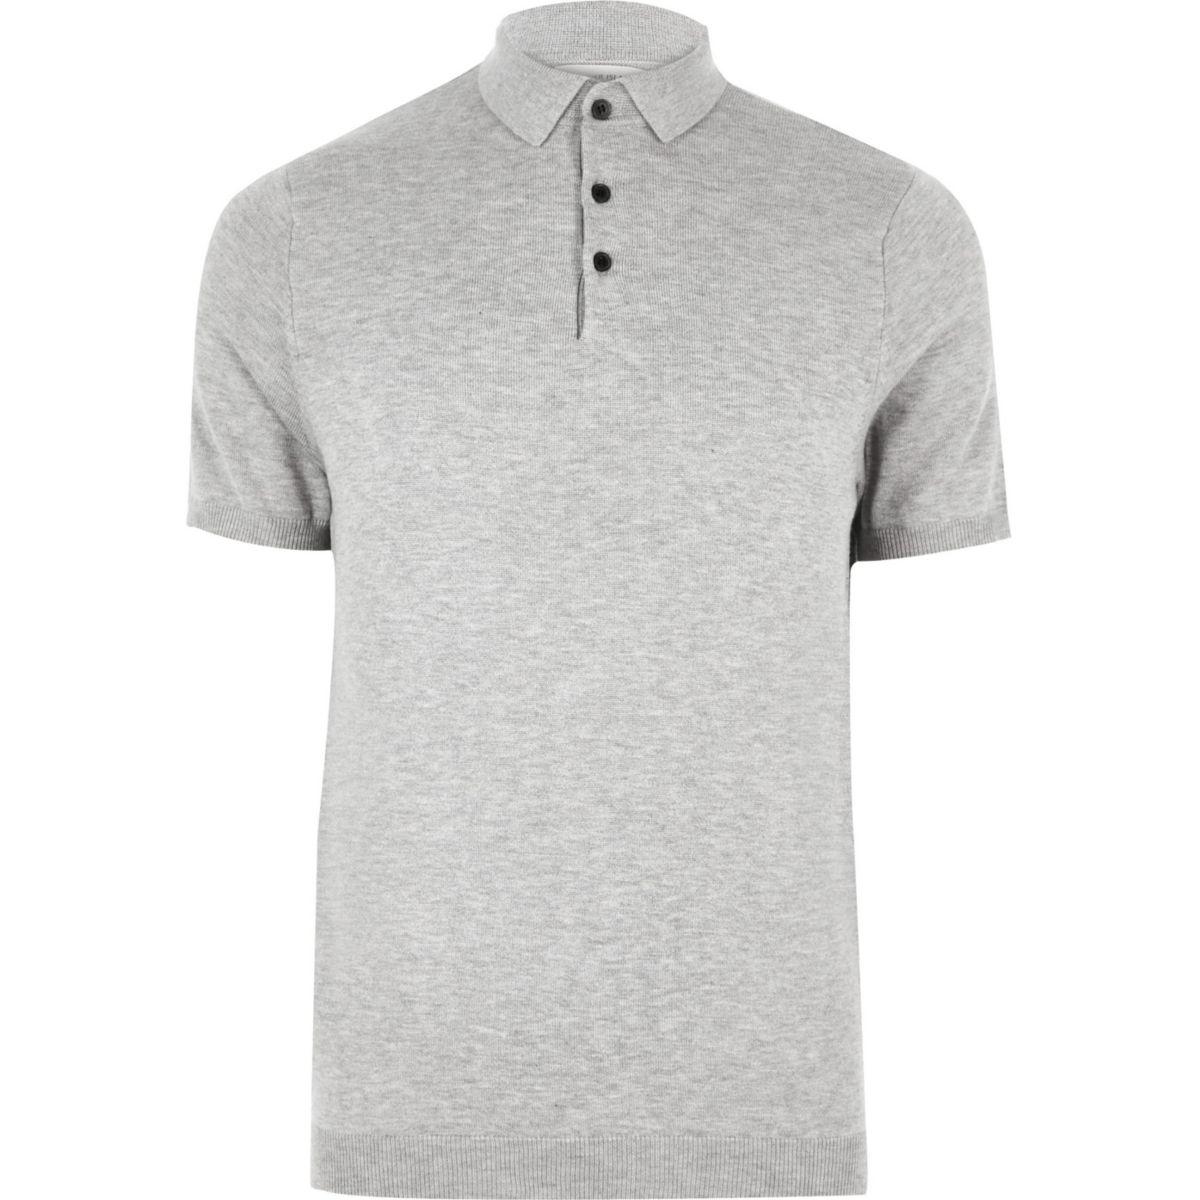 Big and Tall grey knit polo shirt